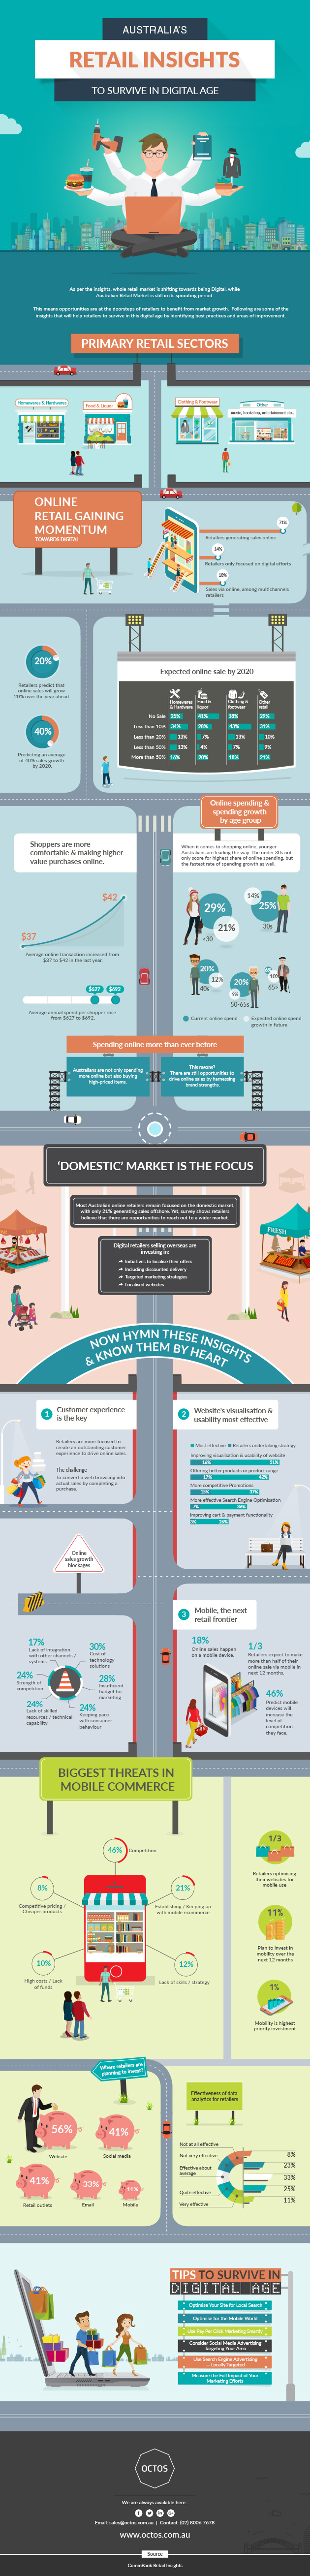 Australia-Retail-Insights